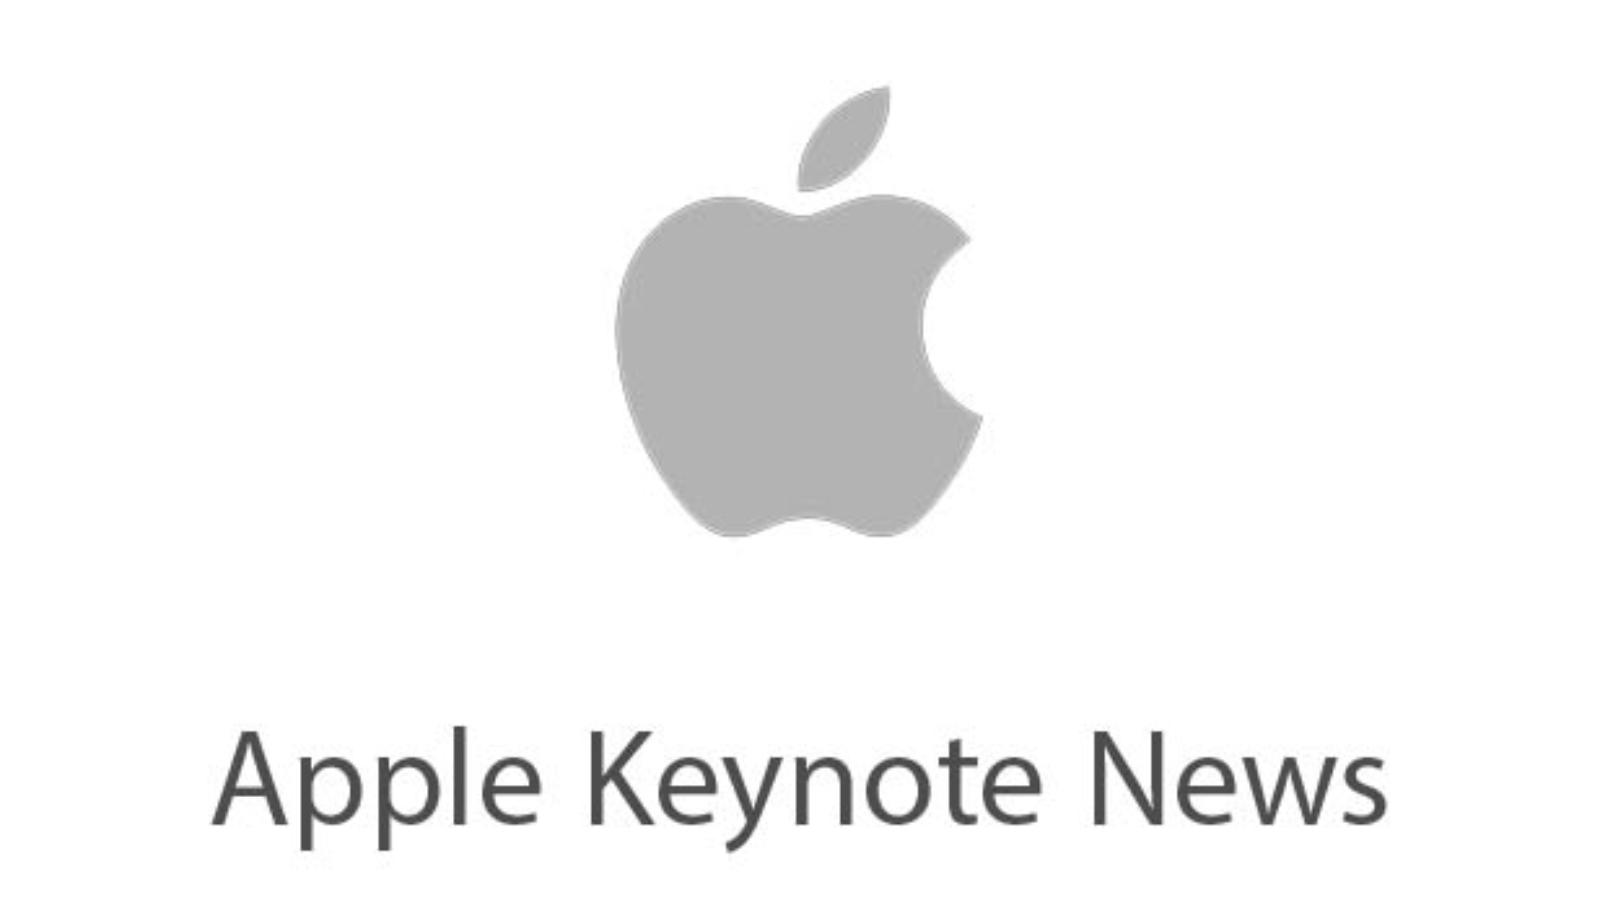 Apple-Keynote-News